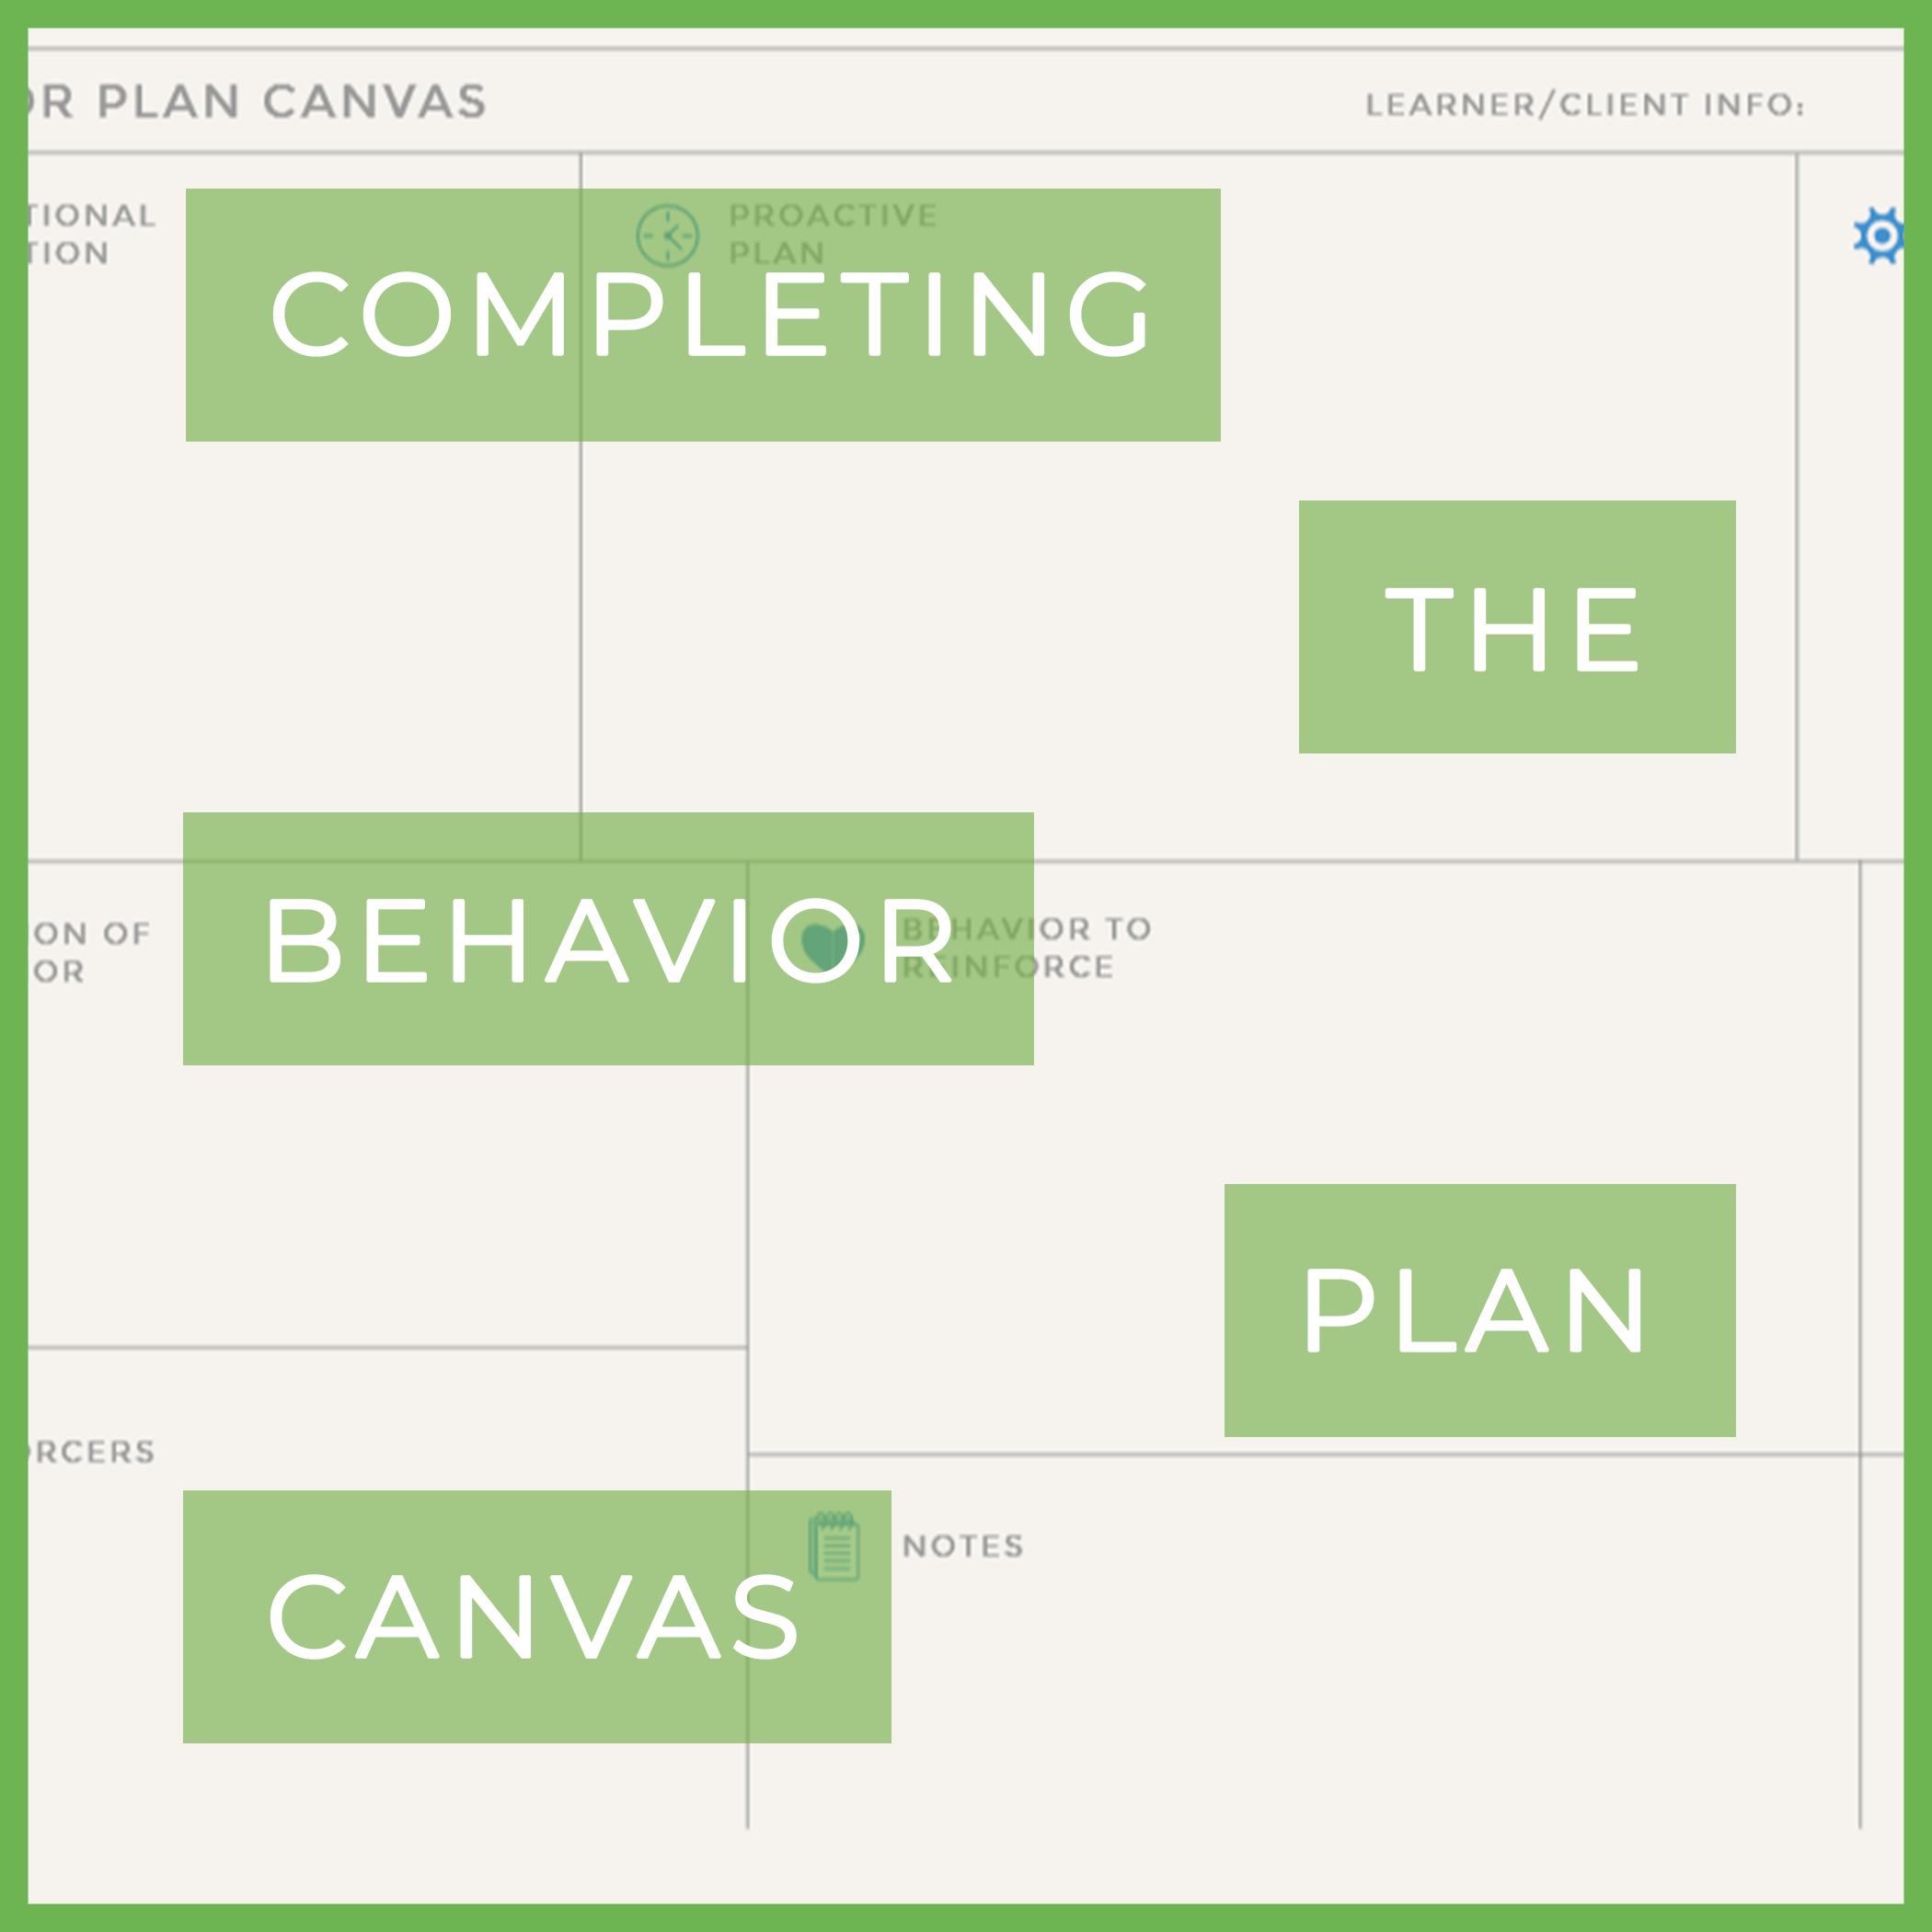 completing behavior plan canvas.png